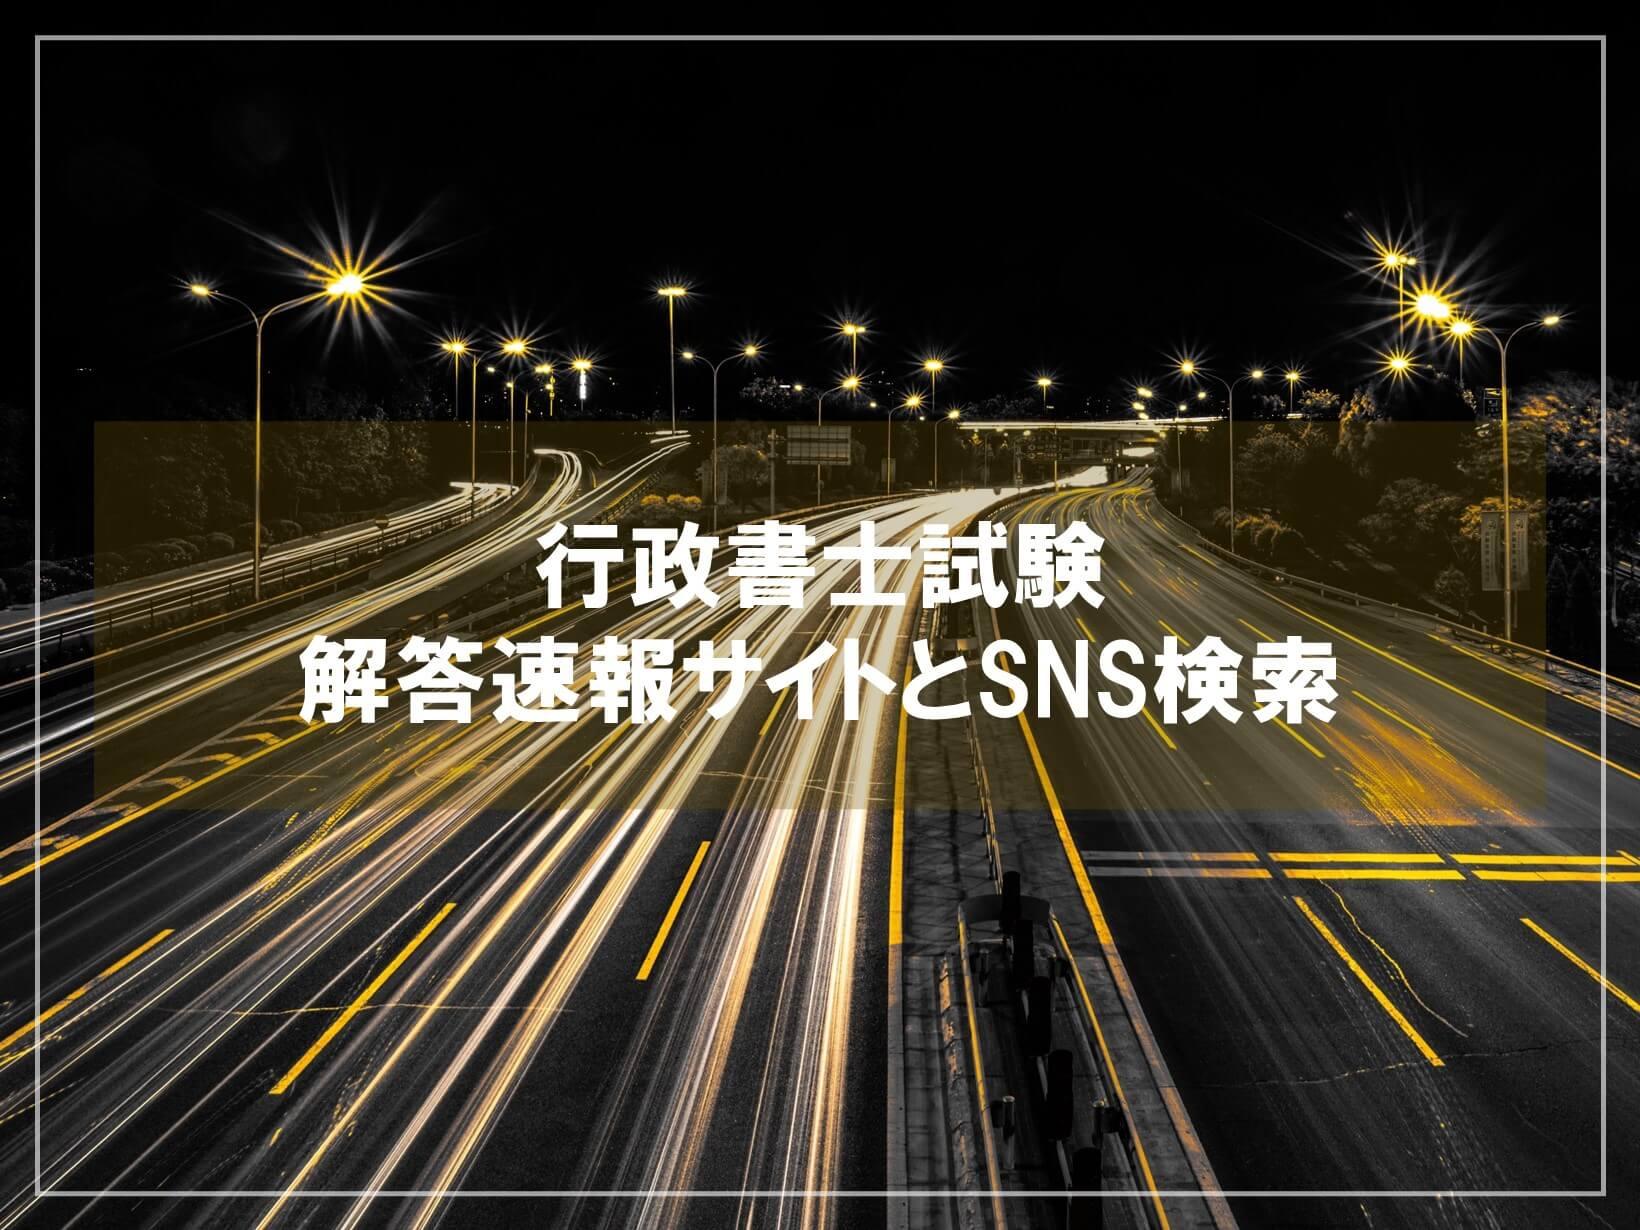 行政書士試験 解答速報サイトとSNS検索